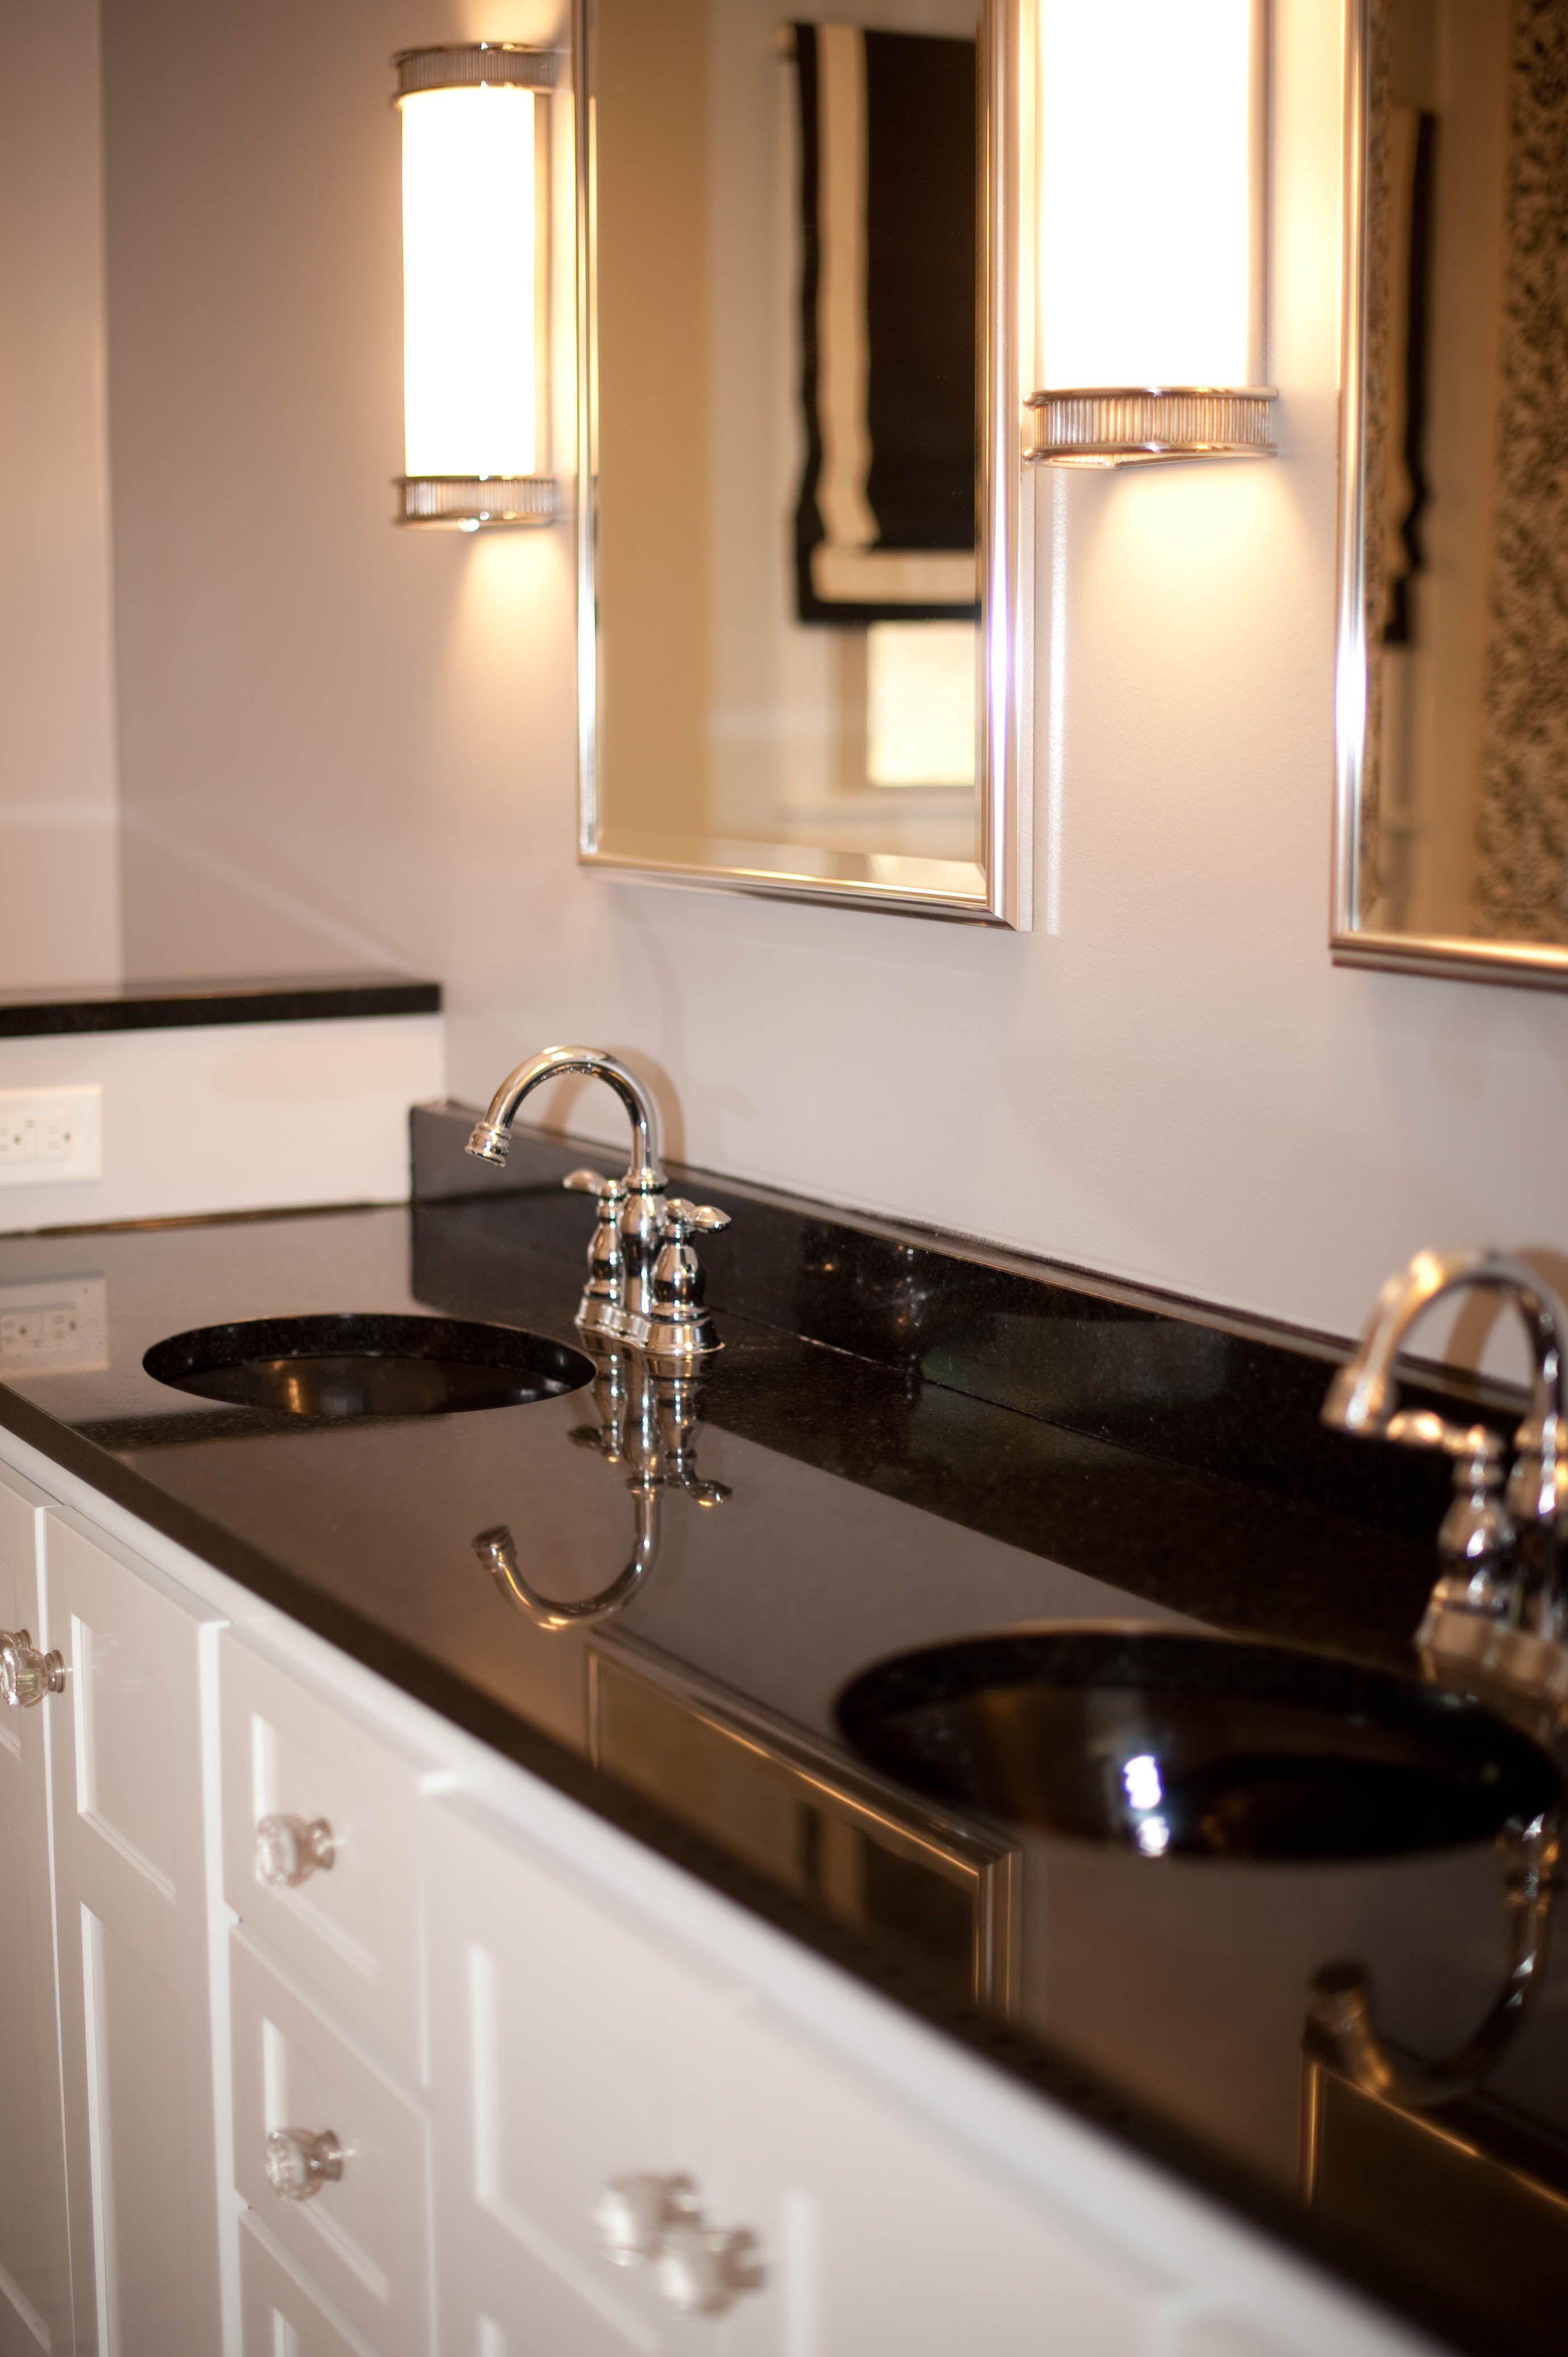 classic black and white bathroom. restoration hardware ... on Bathroom Ideas With Black Granite Countertops  id=54633